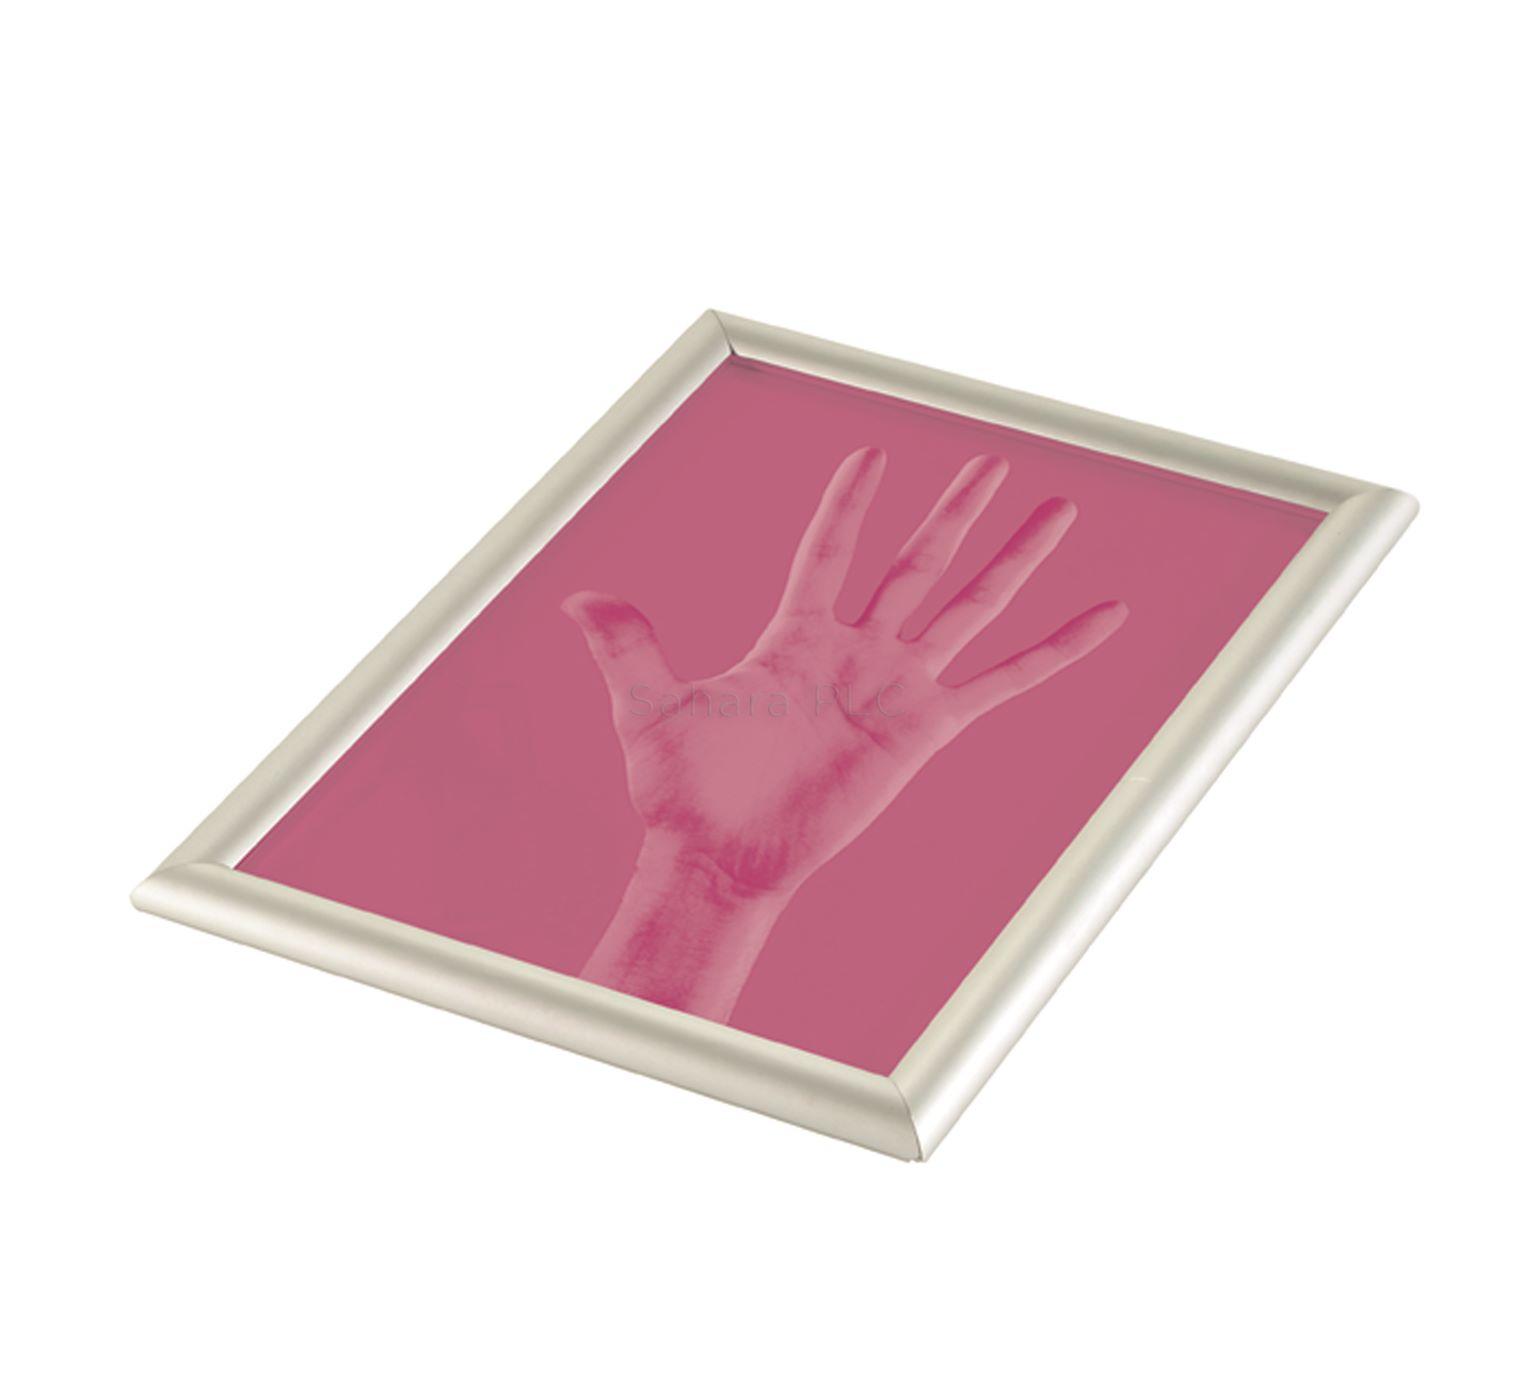 a3 clip poster frame sahara presentation systems plc. Black Bedroom Furniture Sets. Home Design Ideas